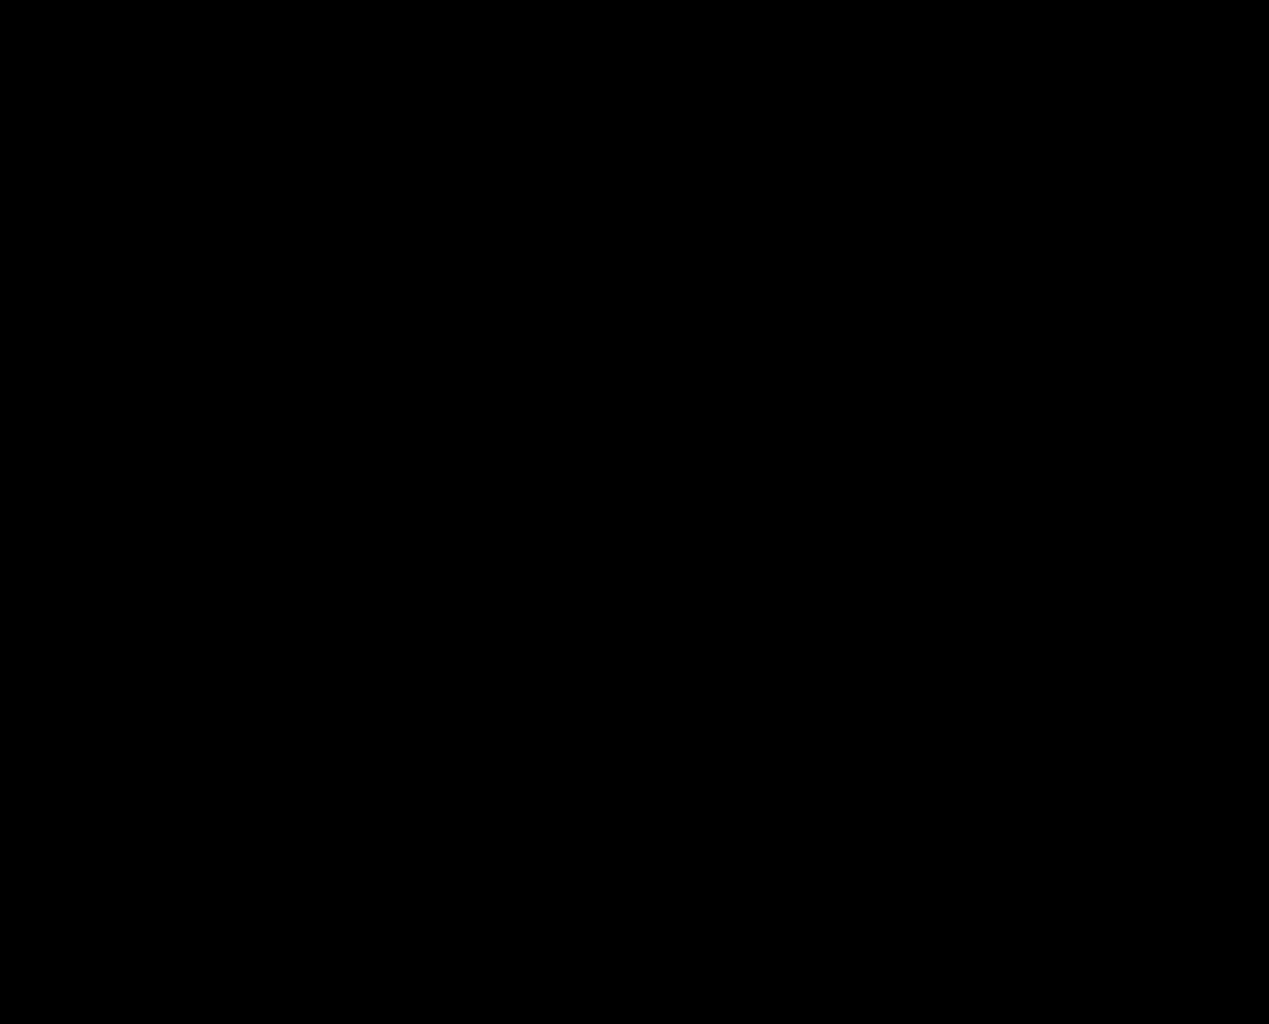 Atovaquone_Structural_Formula_V.1.svg(1)